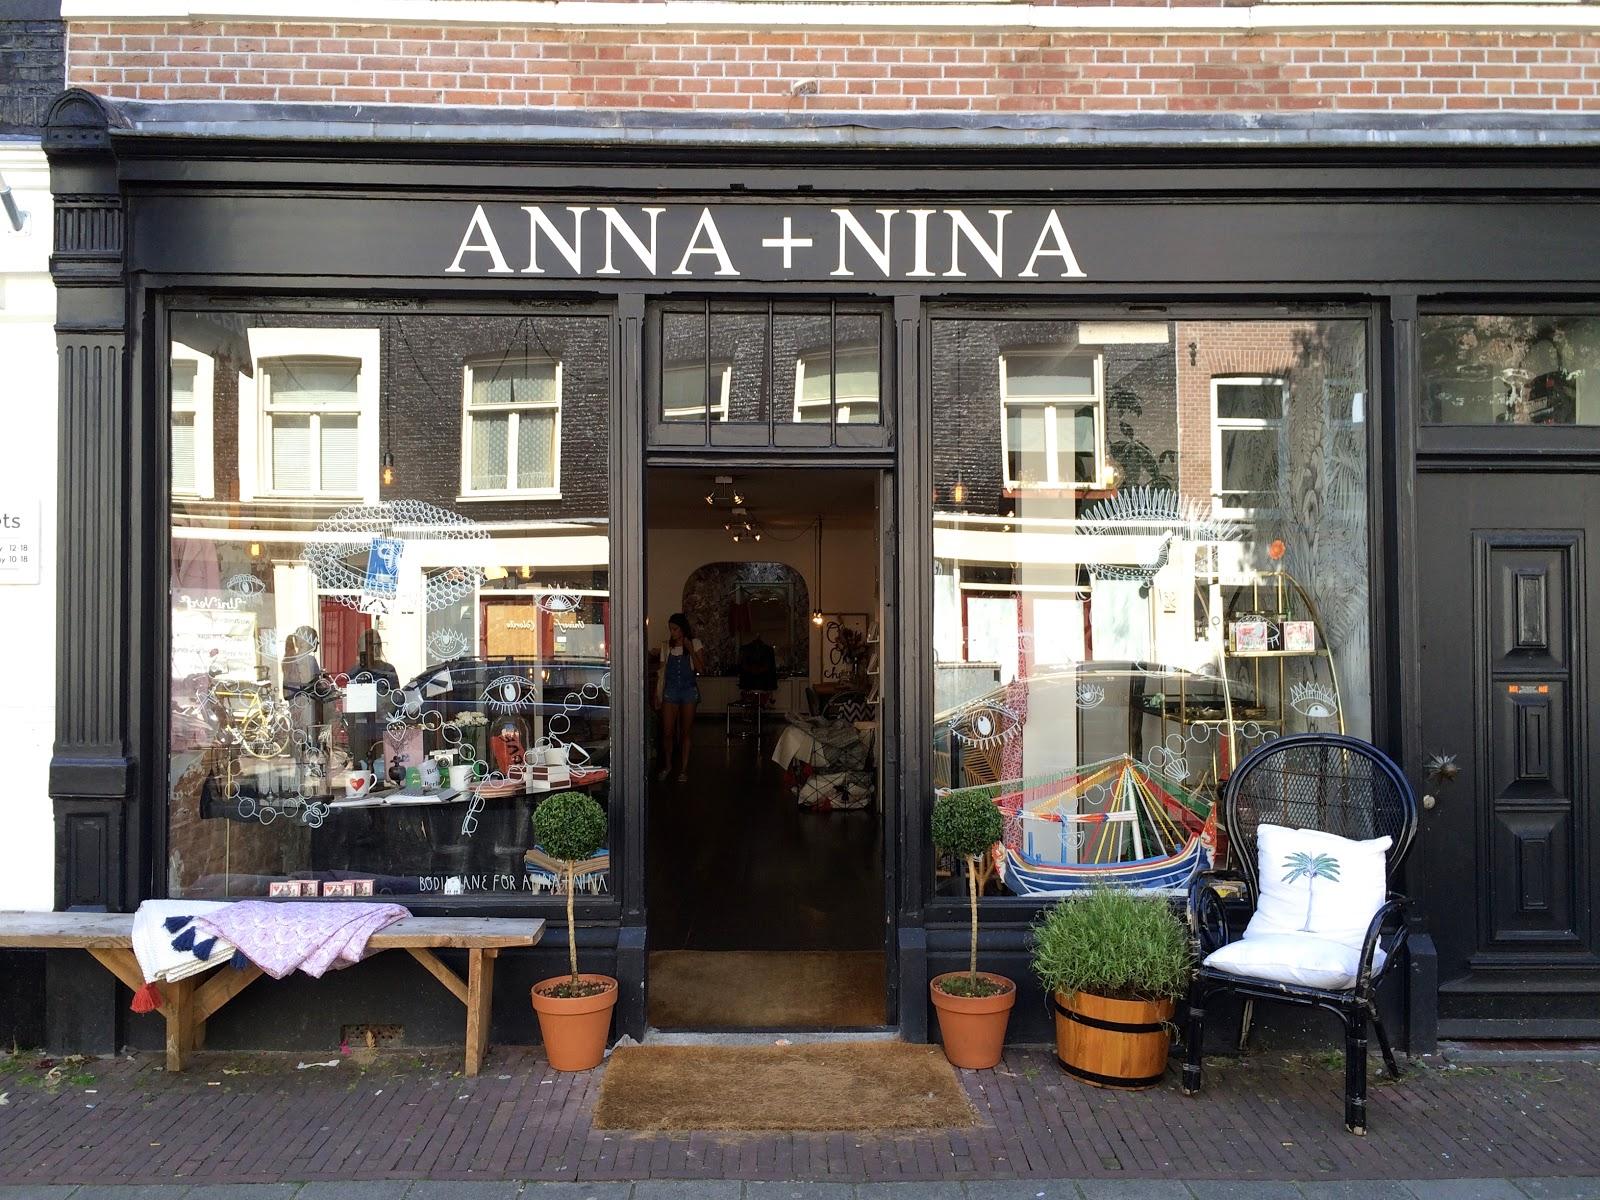 Anna + Nina - shopping for gifts